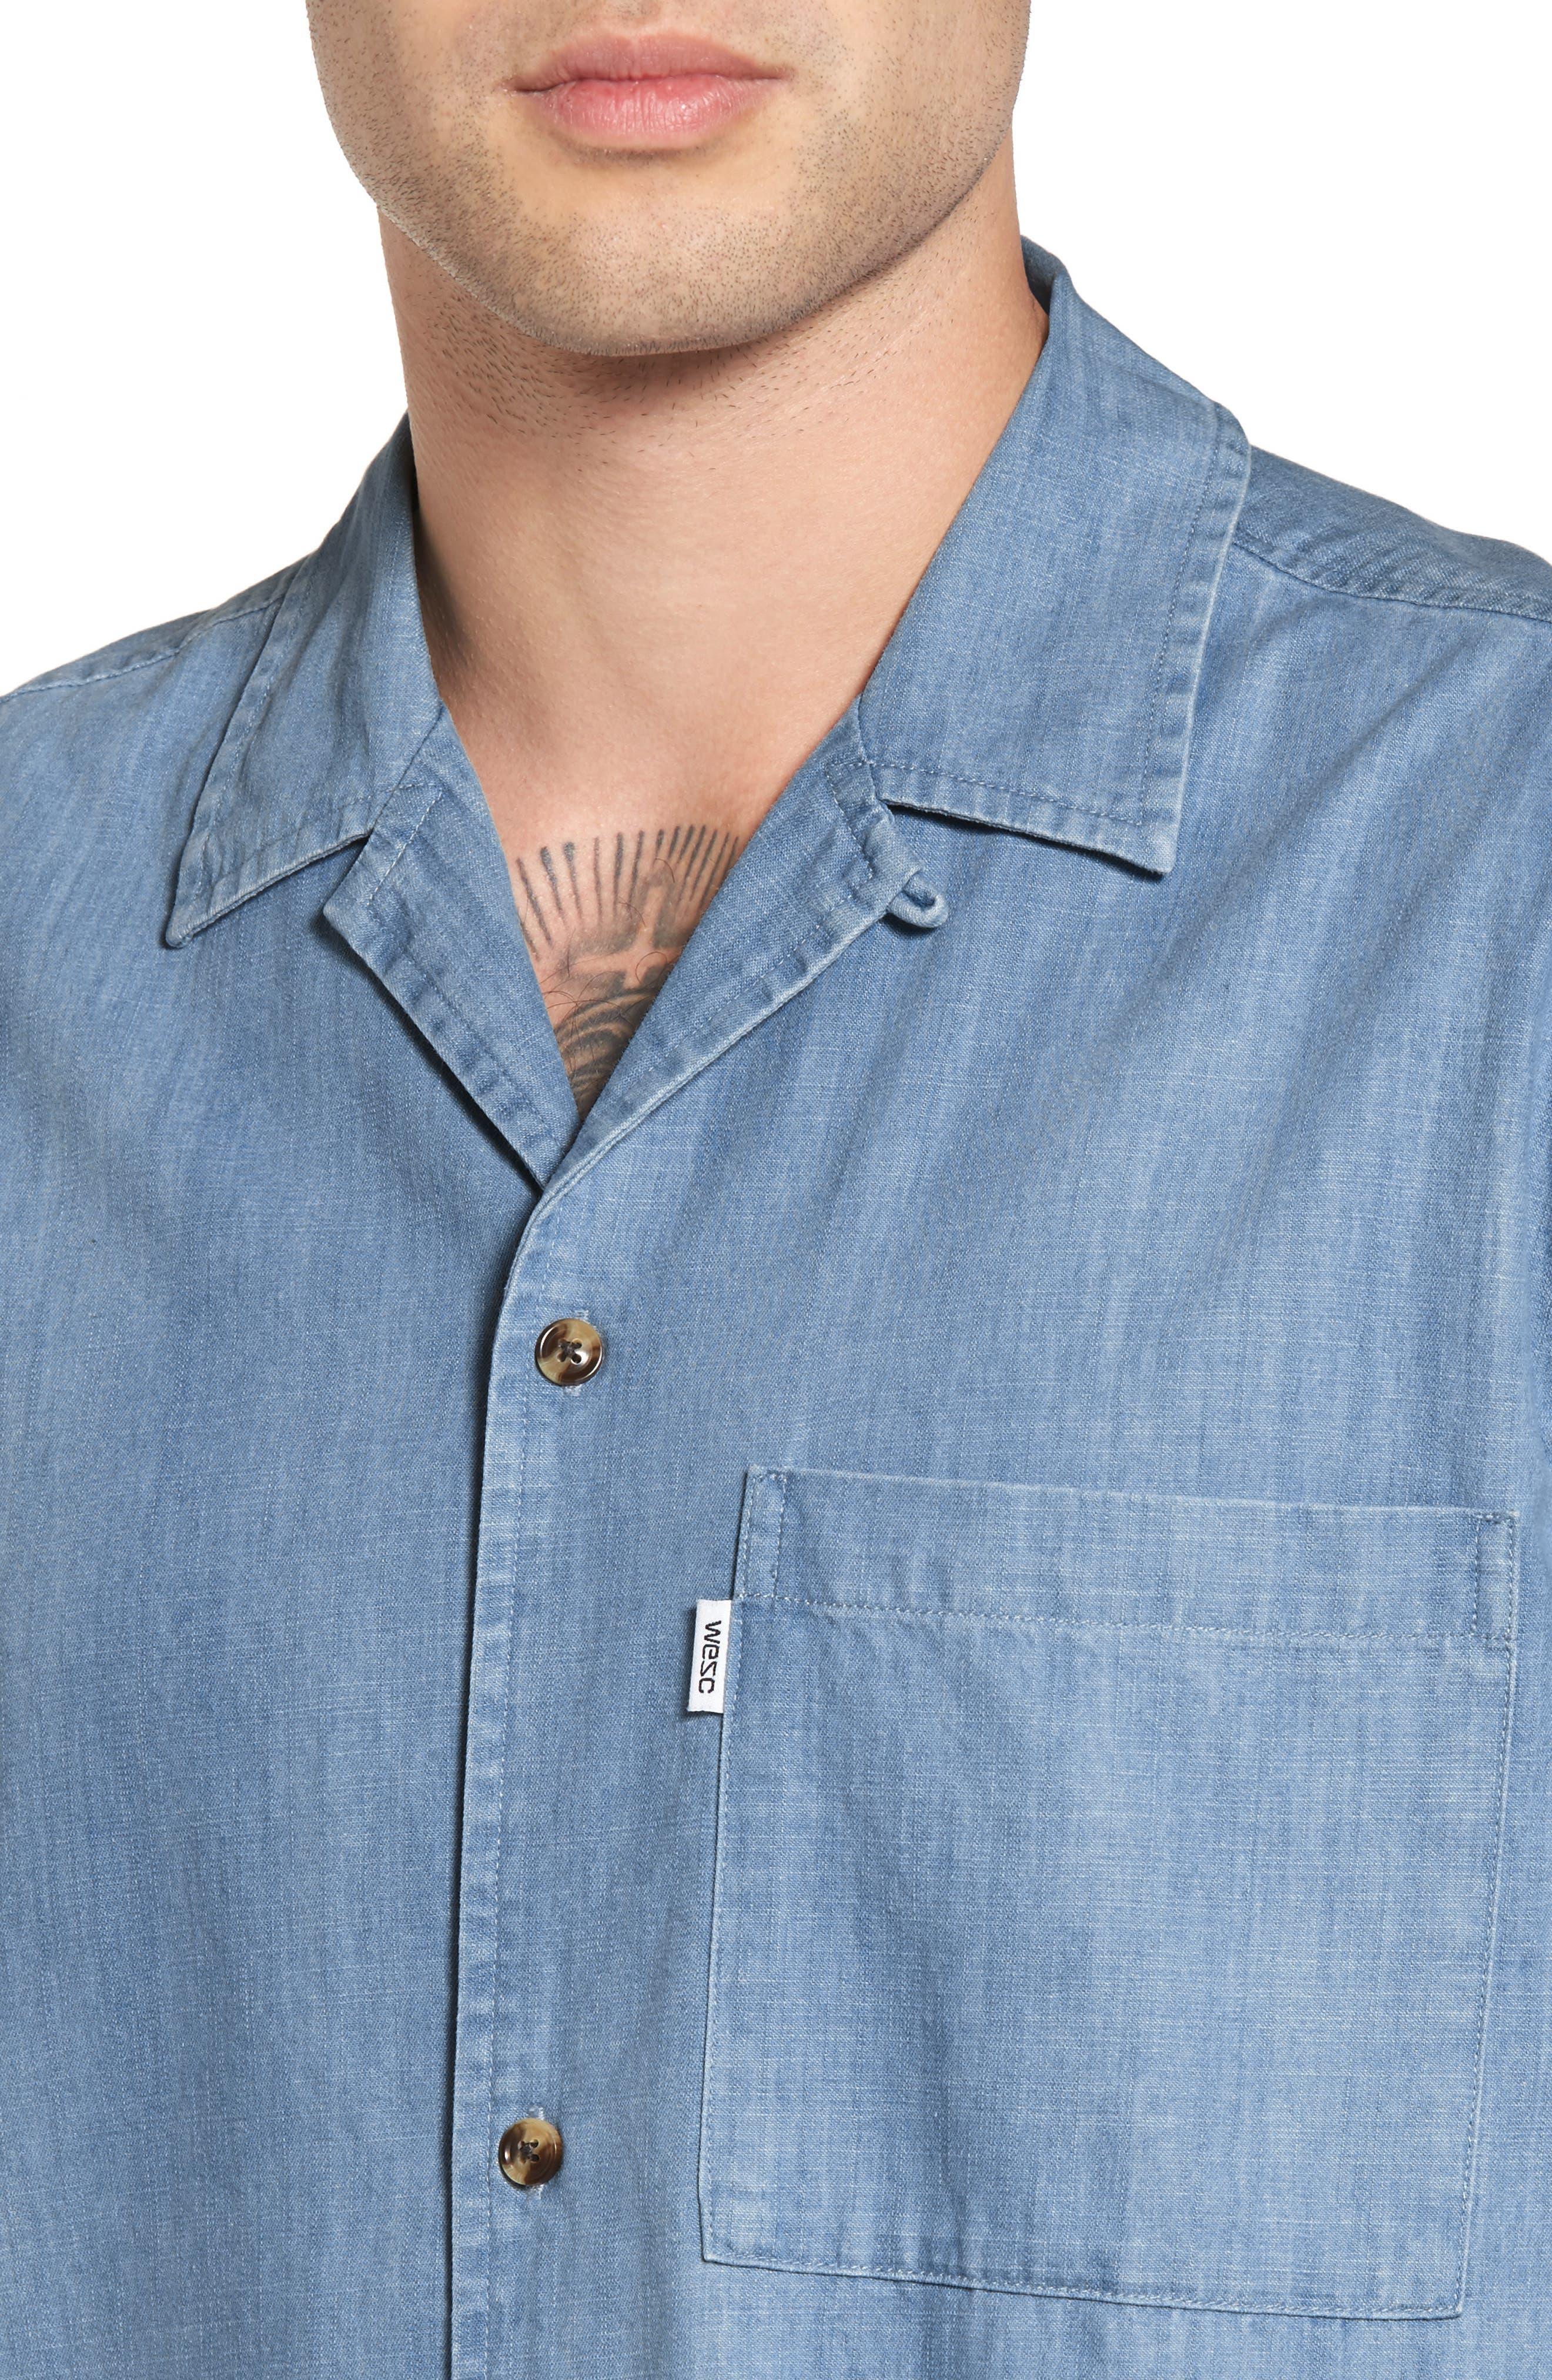 Nevin Short Sleeve Denim Shirt,                             Alternate thumbnail 4, color,                             Polar Blue